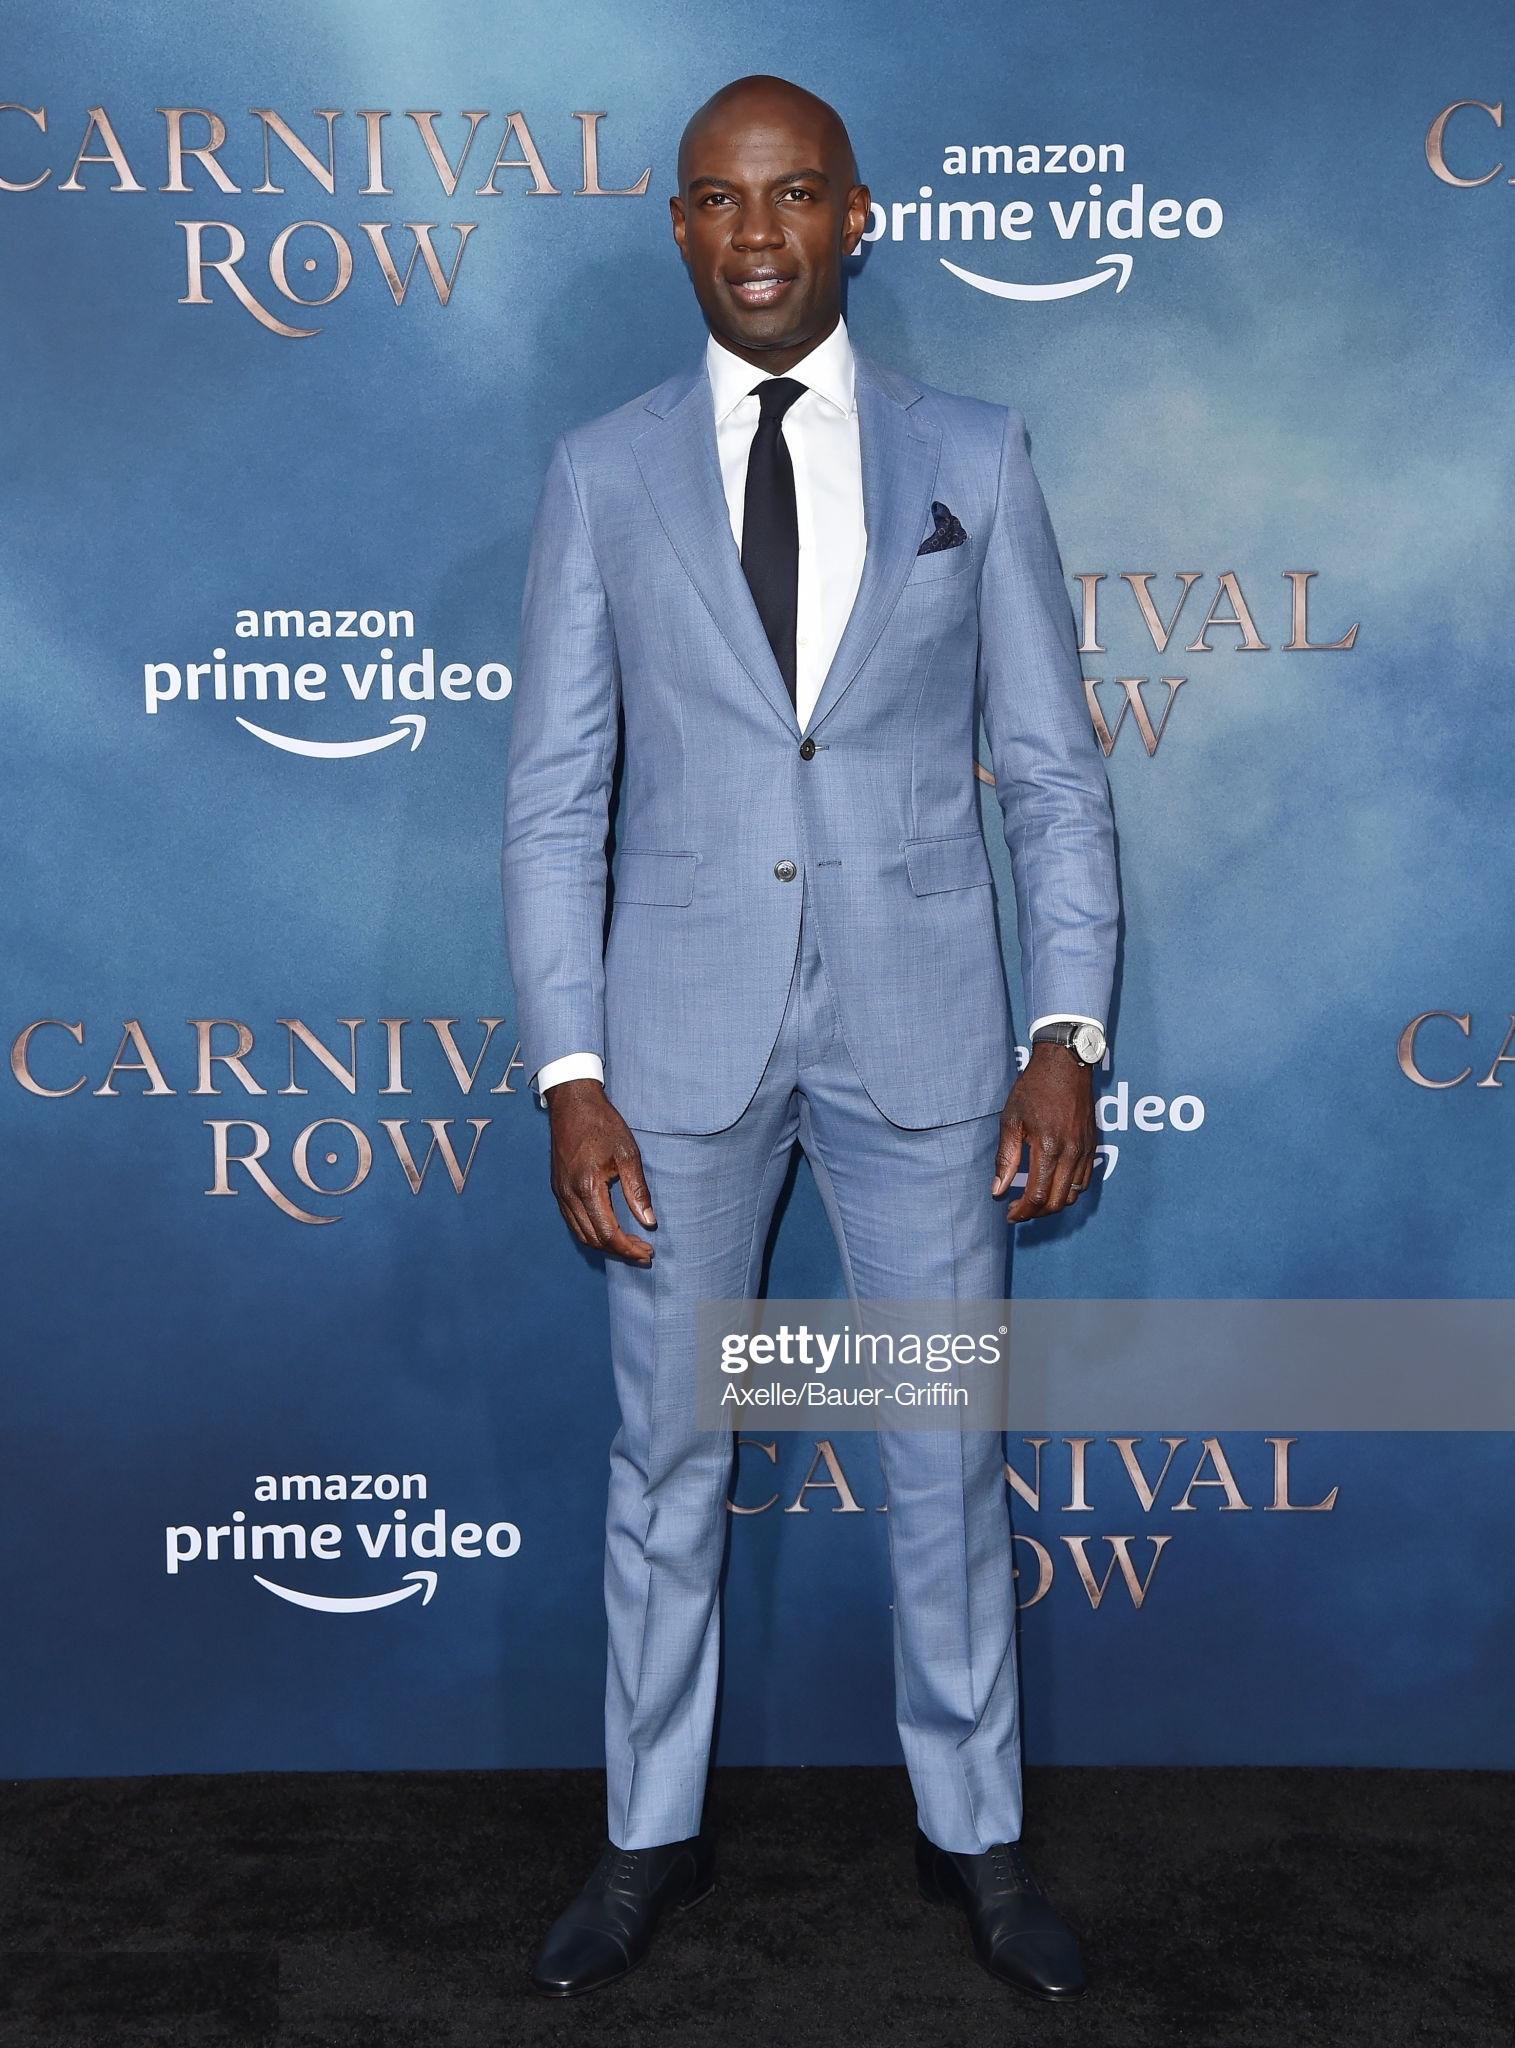 August 21 2019 Carnival Row Premiere LA David Gyasi.jpg